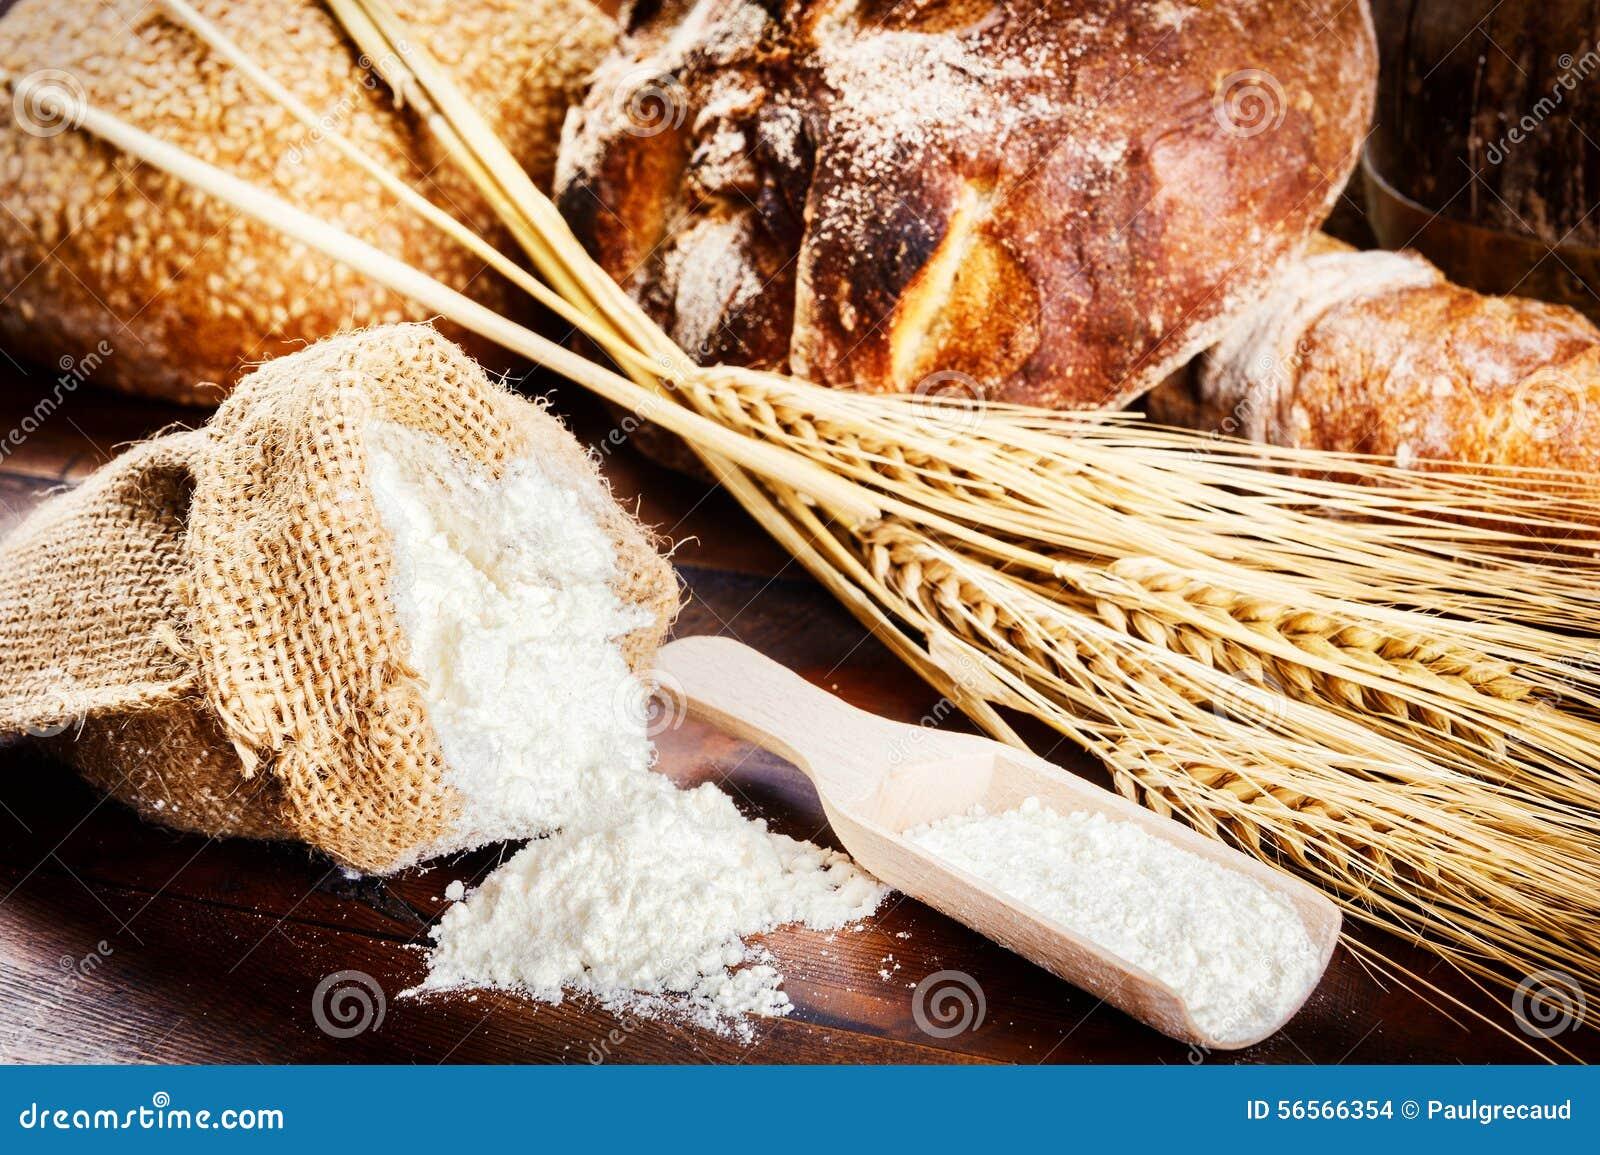 Download Φρέσκα συστατικά ψωμιού και ψησίματος στην αγροτική ρύθμιση Στοκ Εικόνες - εικόνα από σιτάρι, closeup: 56566354